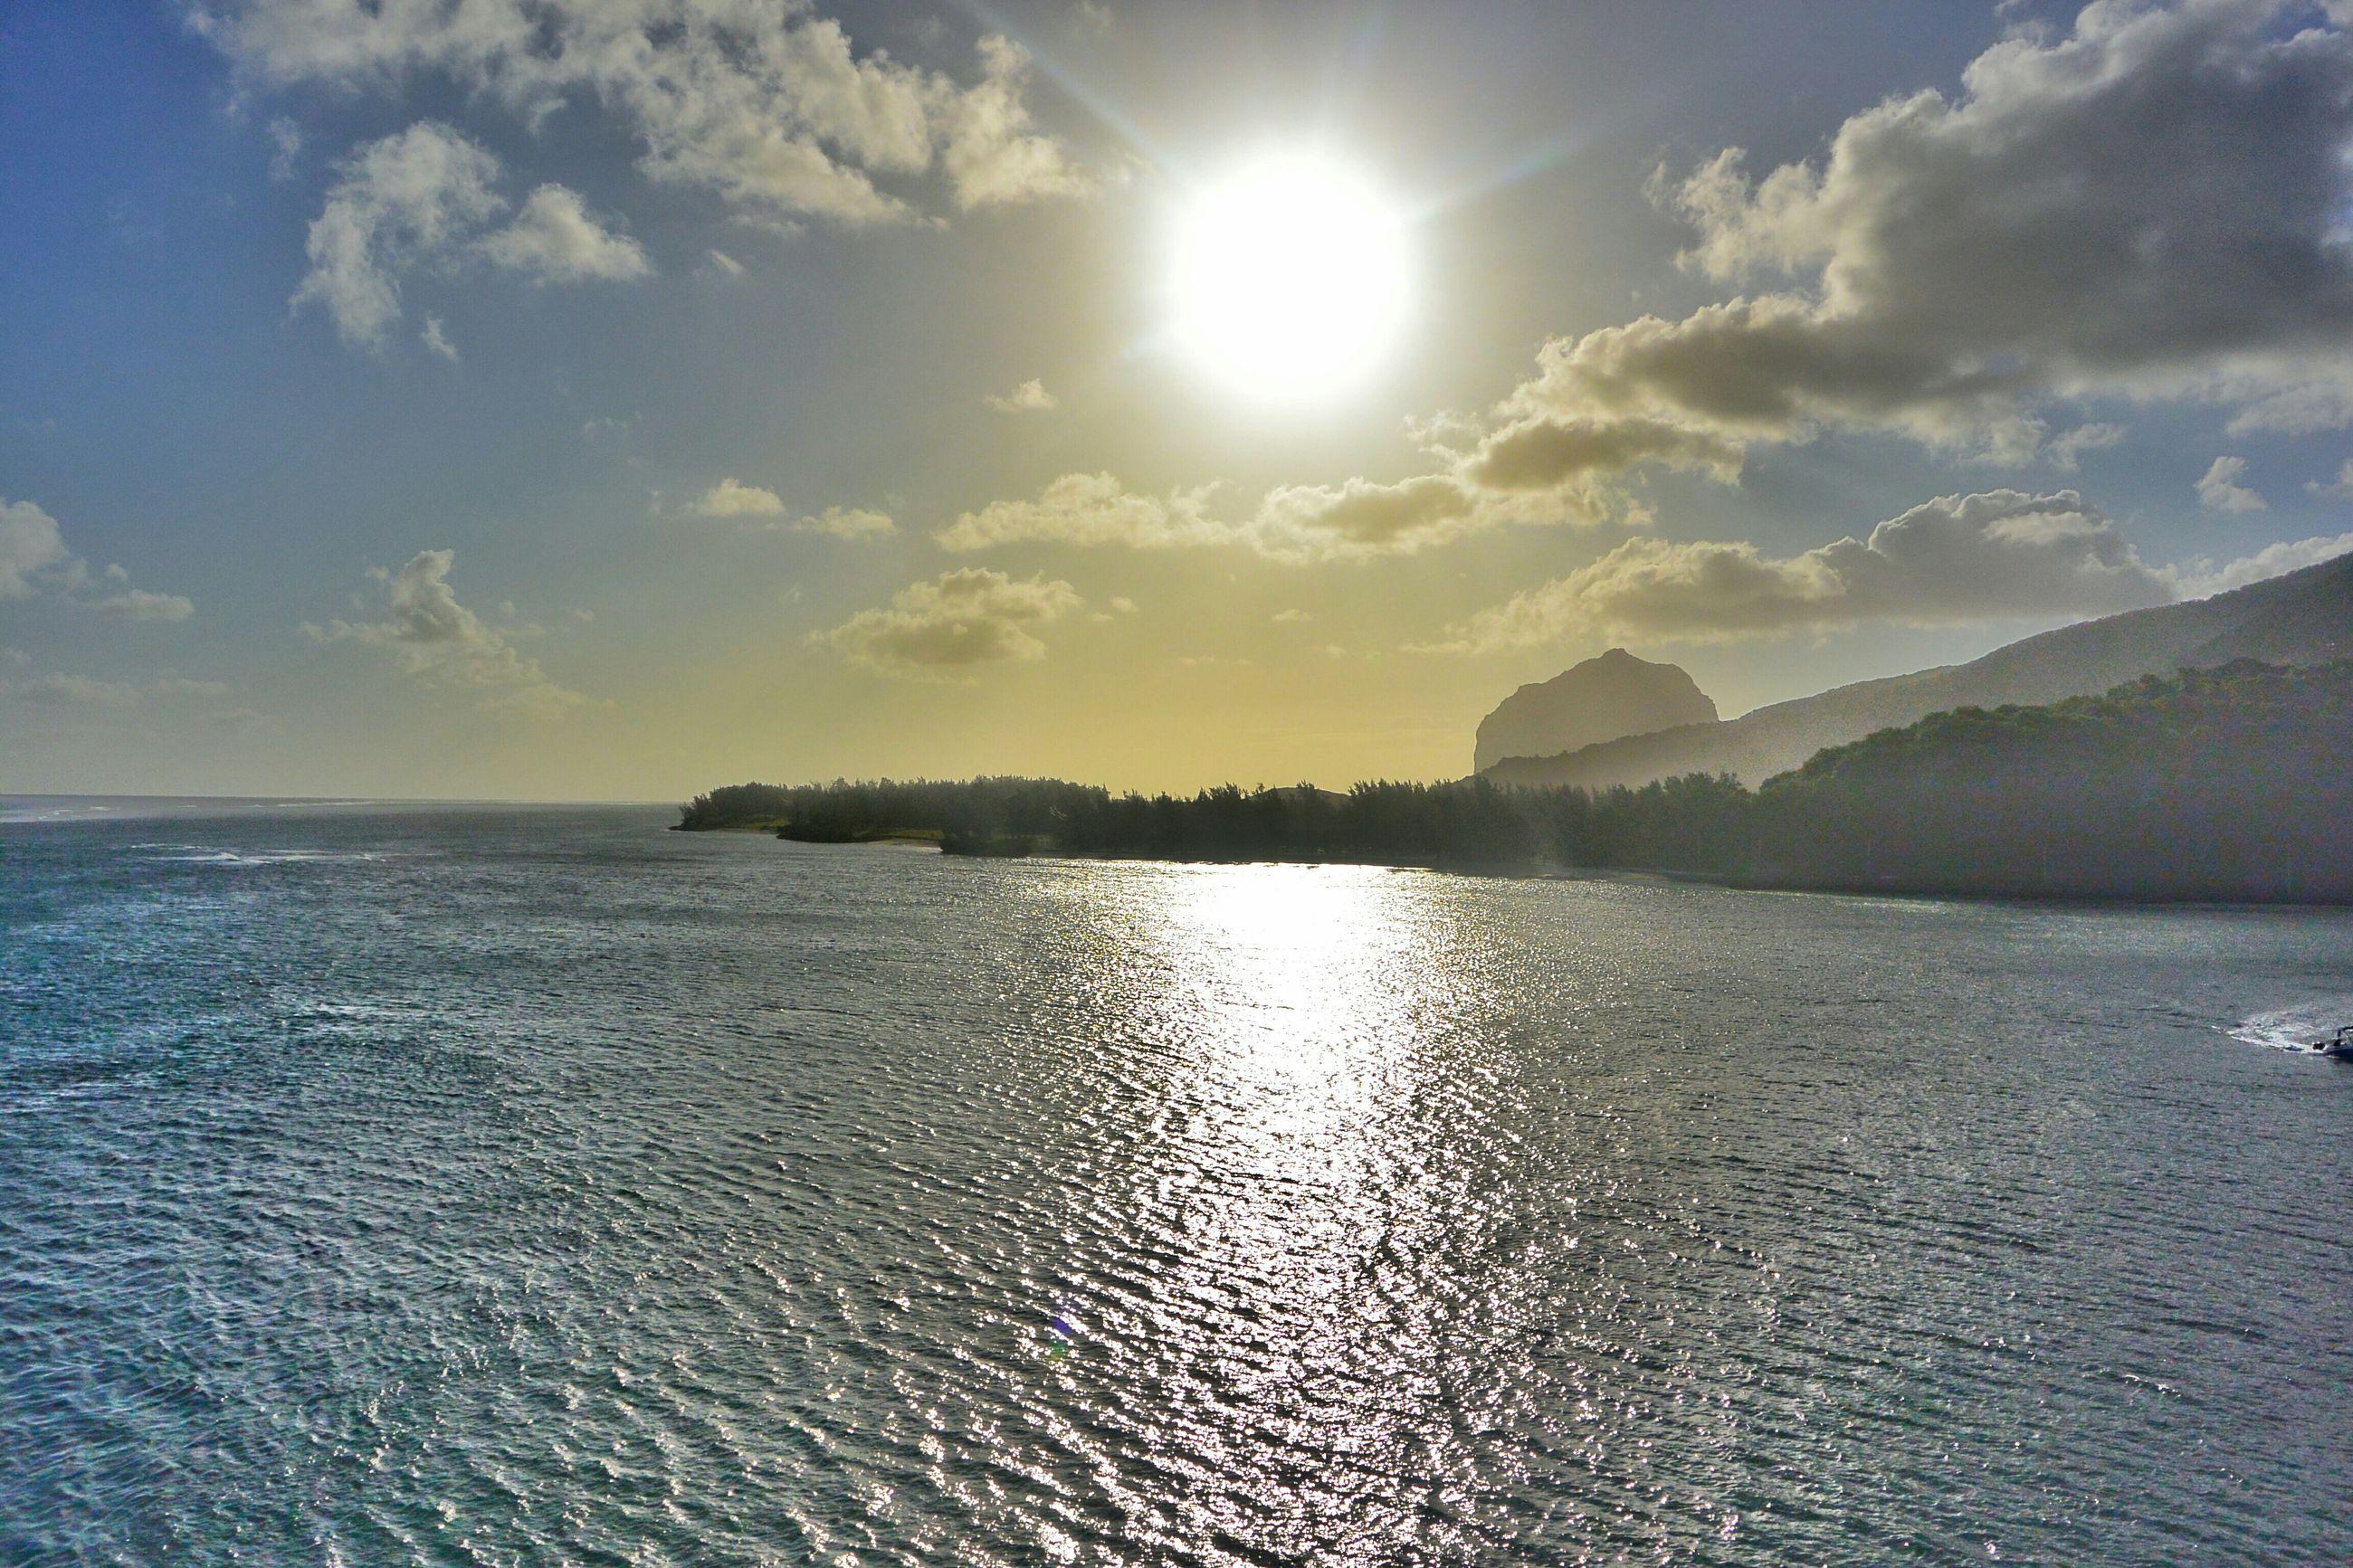 water, sun, tranquil scene, tranquility, scenics, reflection, sky, beauty in nature, sunlight, sea, sunbeam, nature, waterfront, mountain, rippled, idyllic, lens flare, lake, cloud - sky, sunset